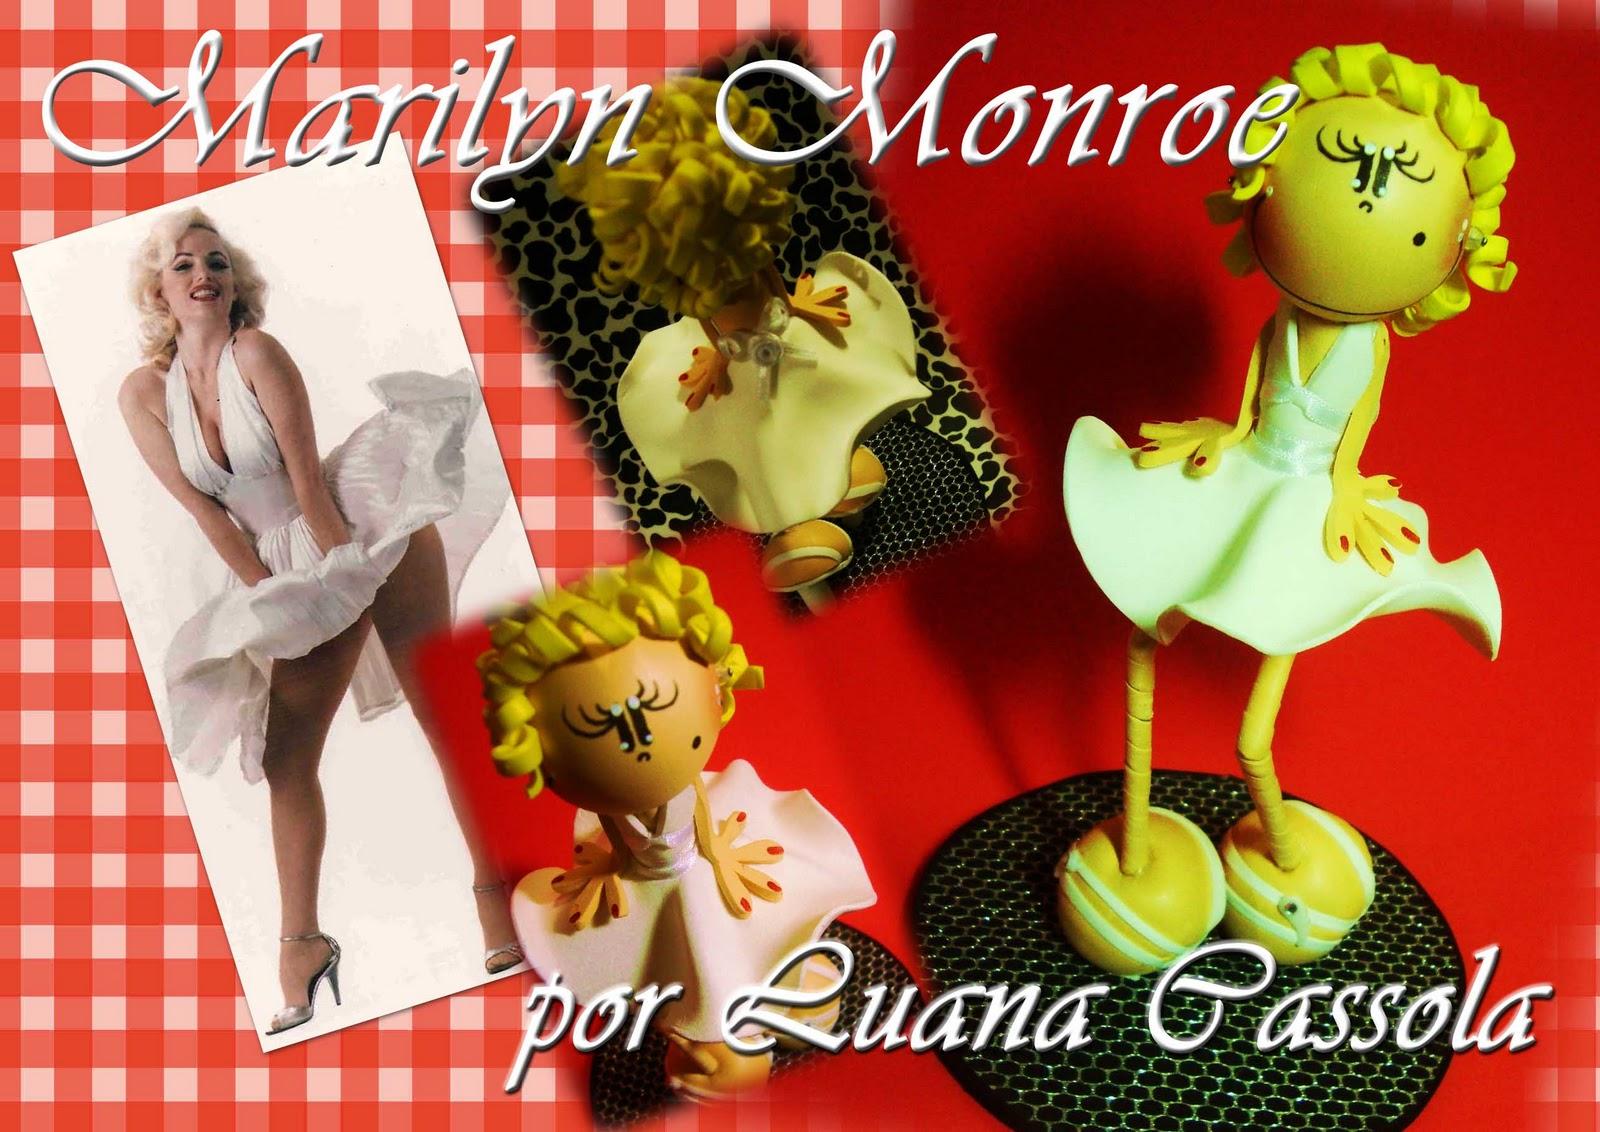 http://1.bp.blogspot.com/_4ntI9DCe4VU/TSjtTsmYL8I/AAAAAAAAAYY/rYkM-CzjNVg/s1600/marilyn_monroe.jpg